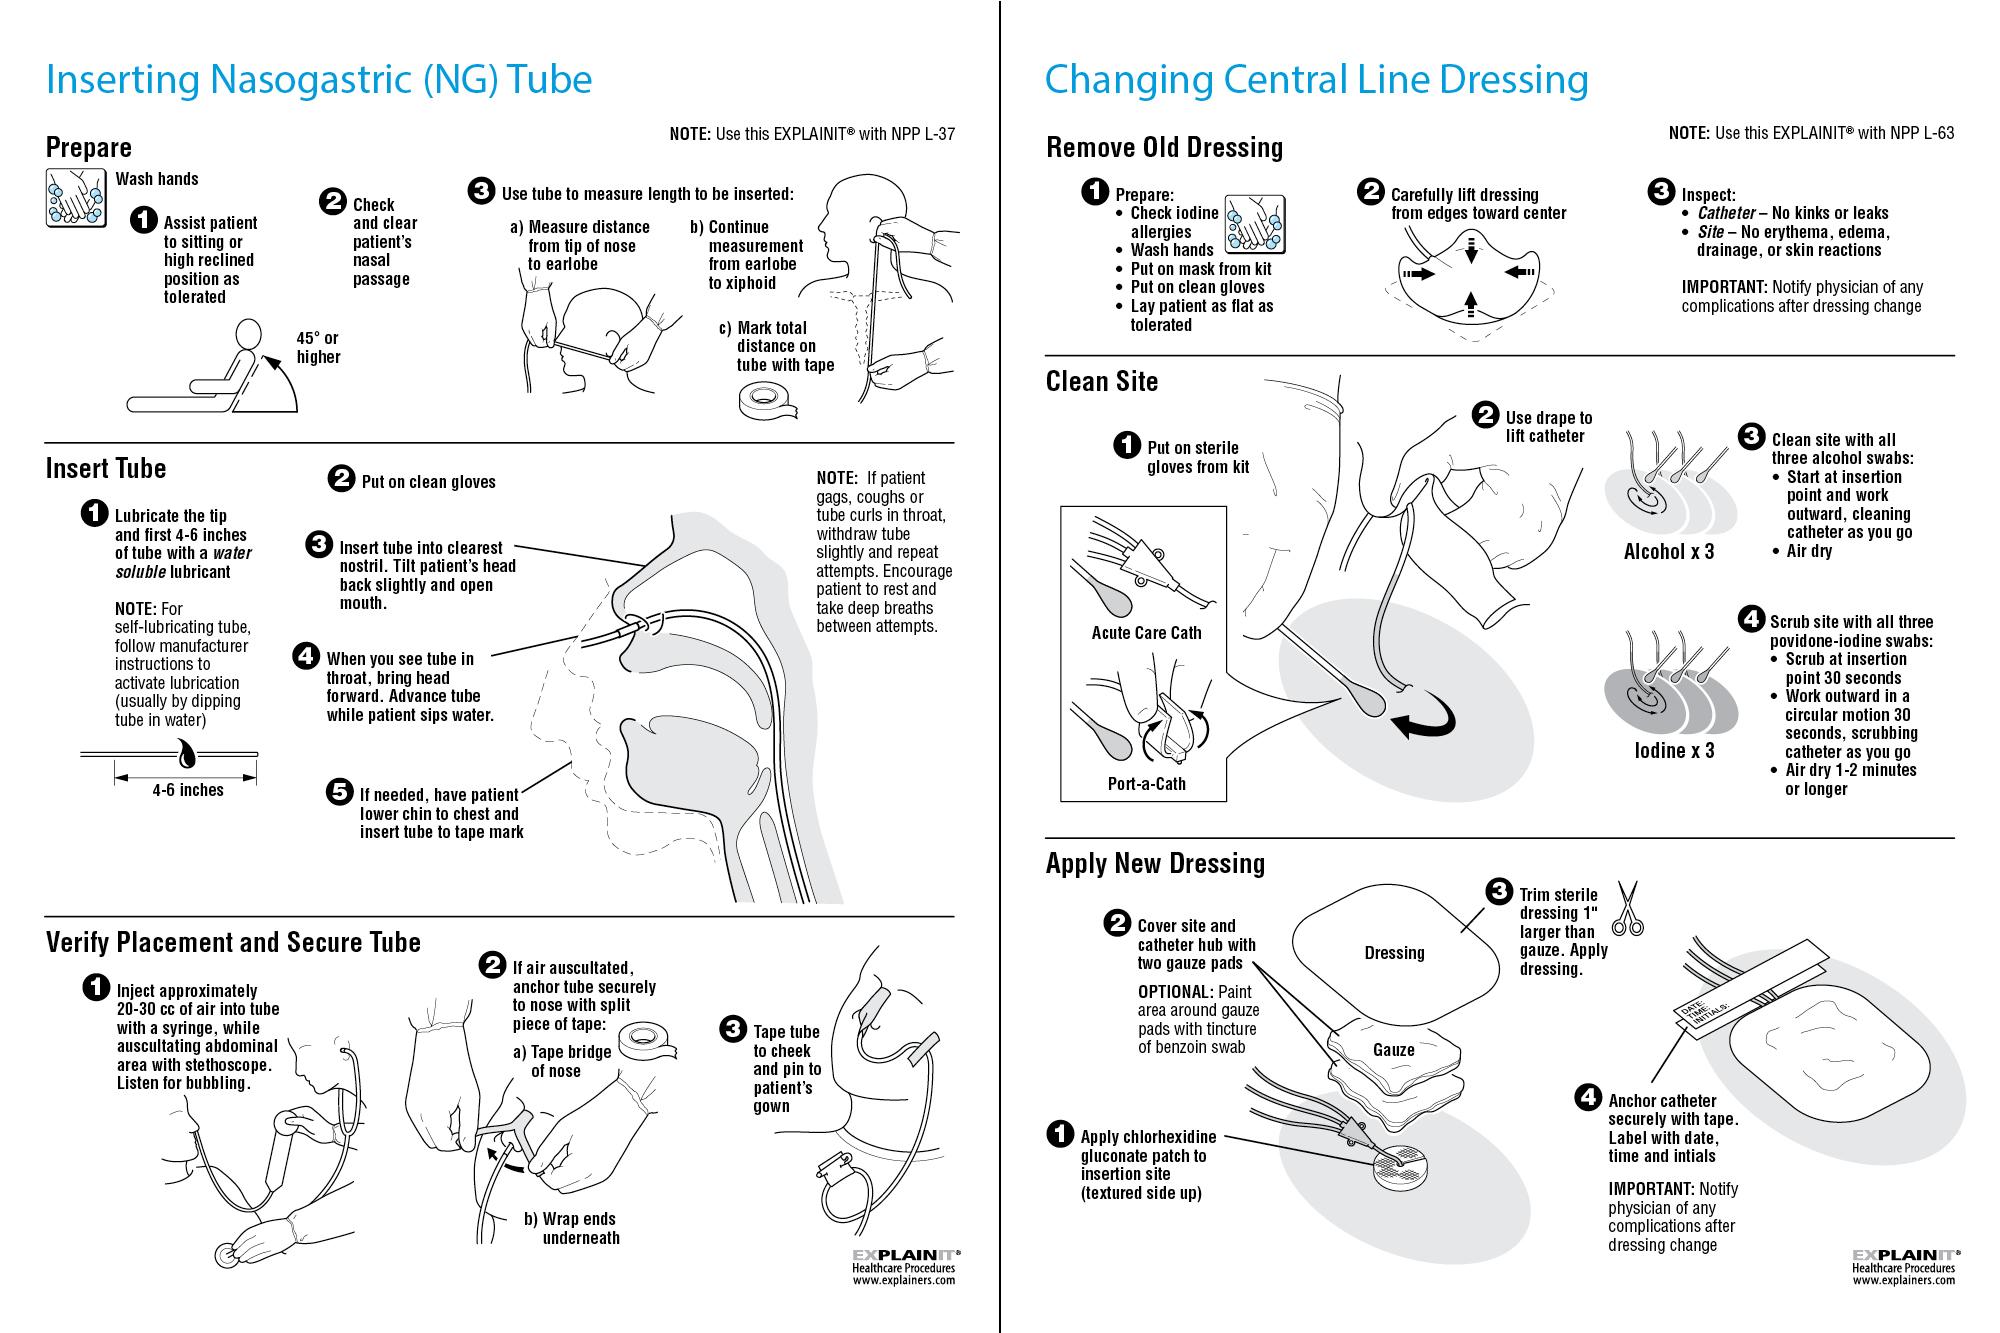 Explainers: Nursing Procedures